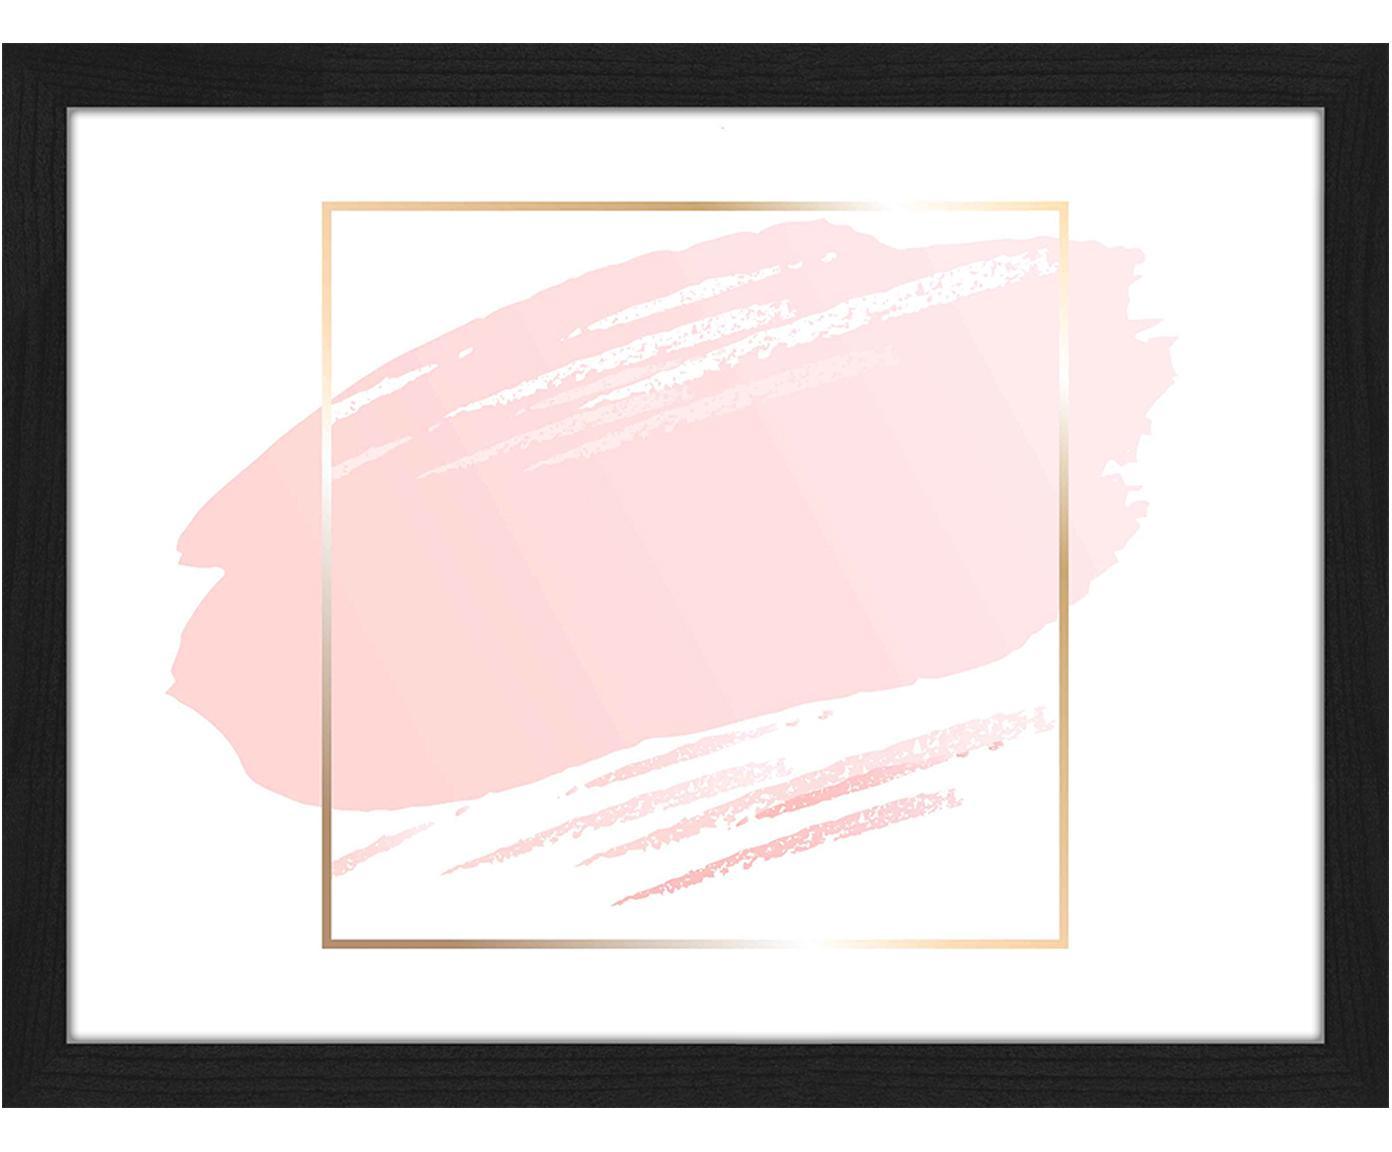 Impresión digital enmarcada Pink Brush, Blanco, rosa, dorado, An 33 x Al 43 cm